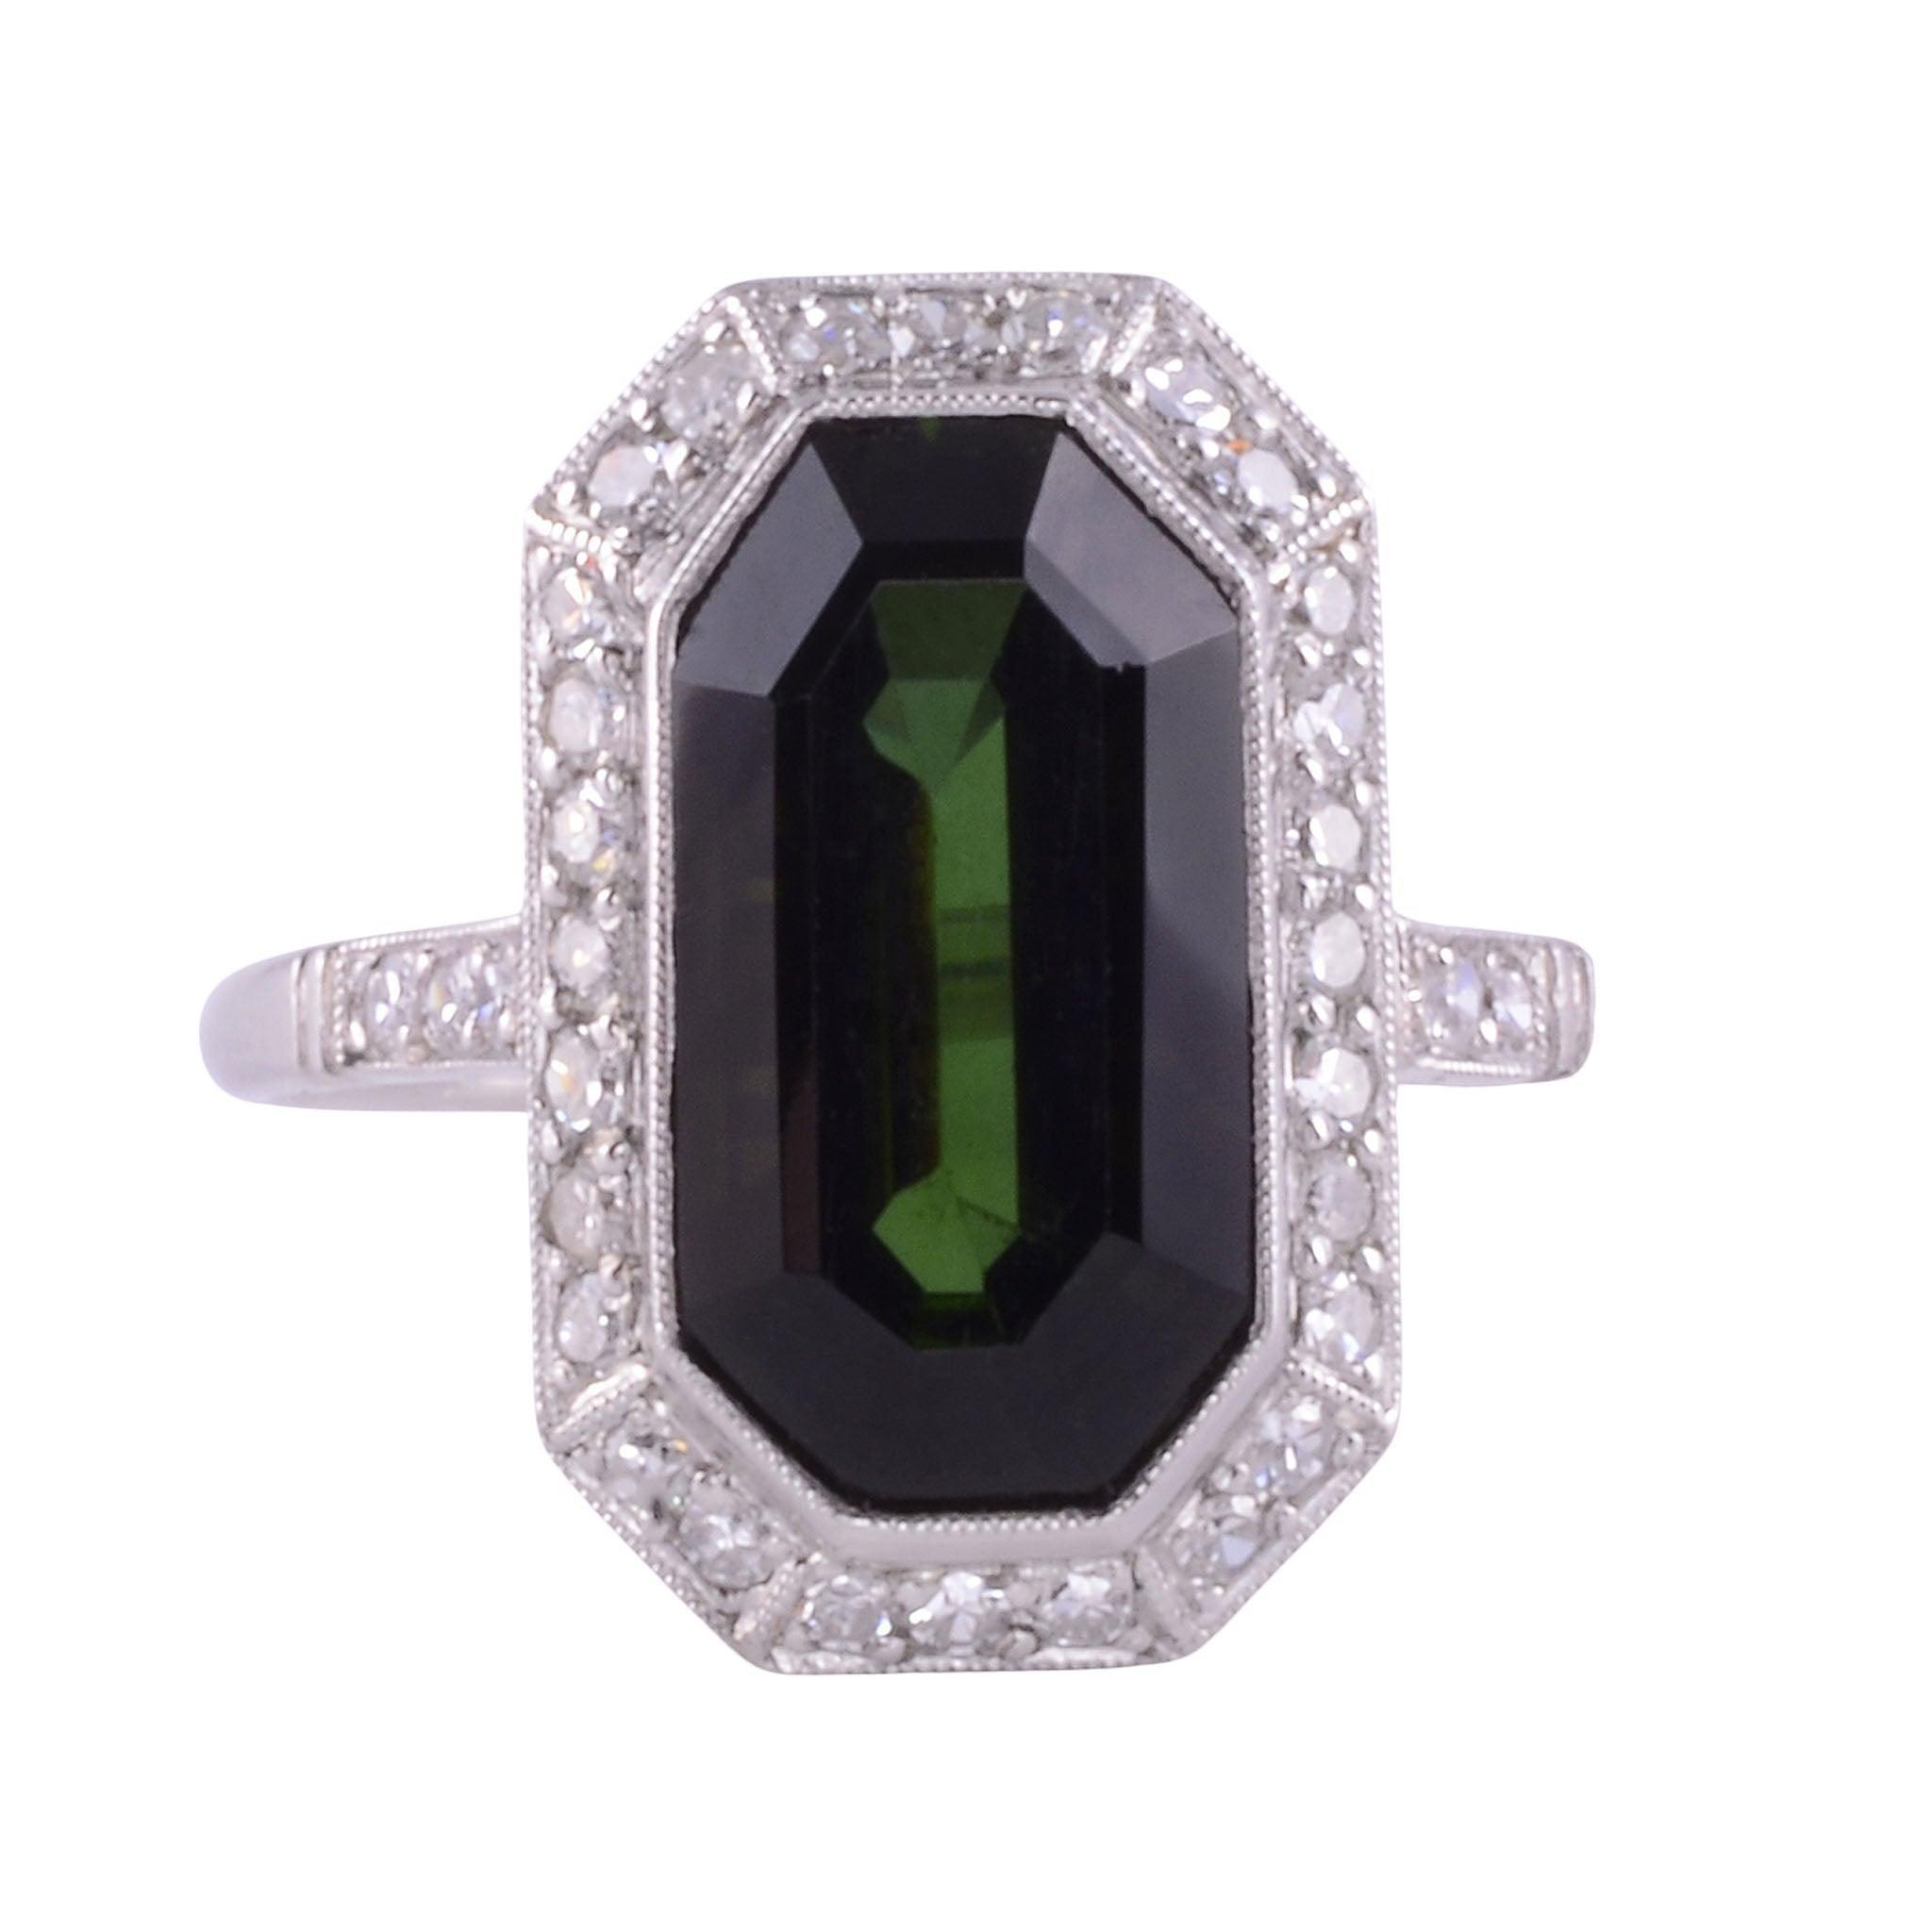 4.06 Carat Green Tourmaline Platinum Ring